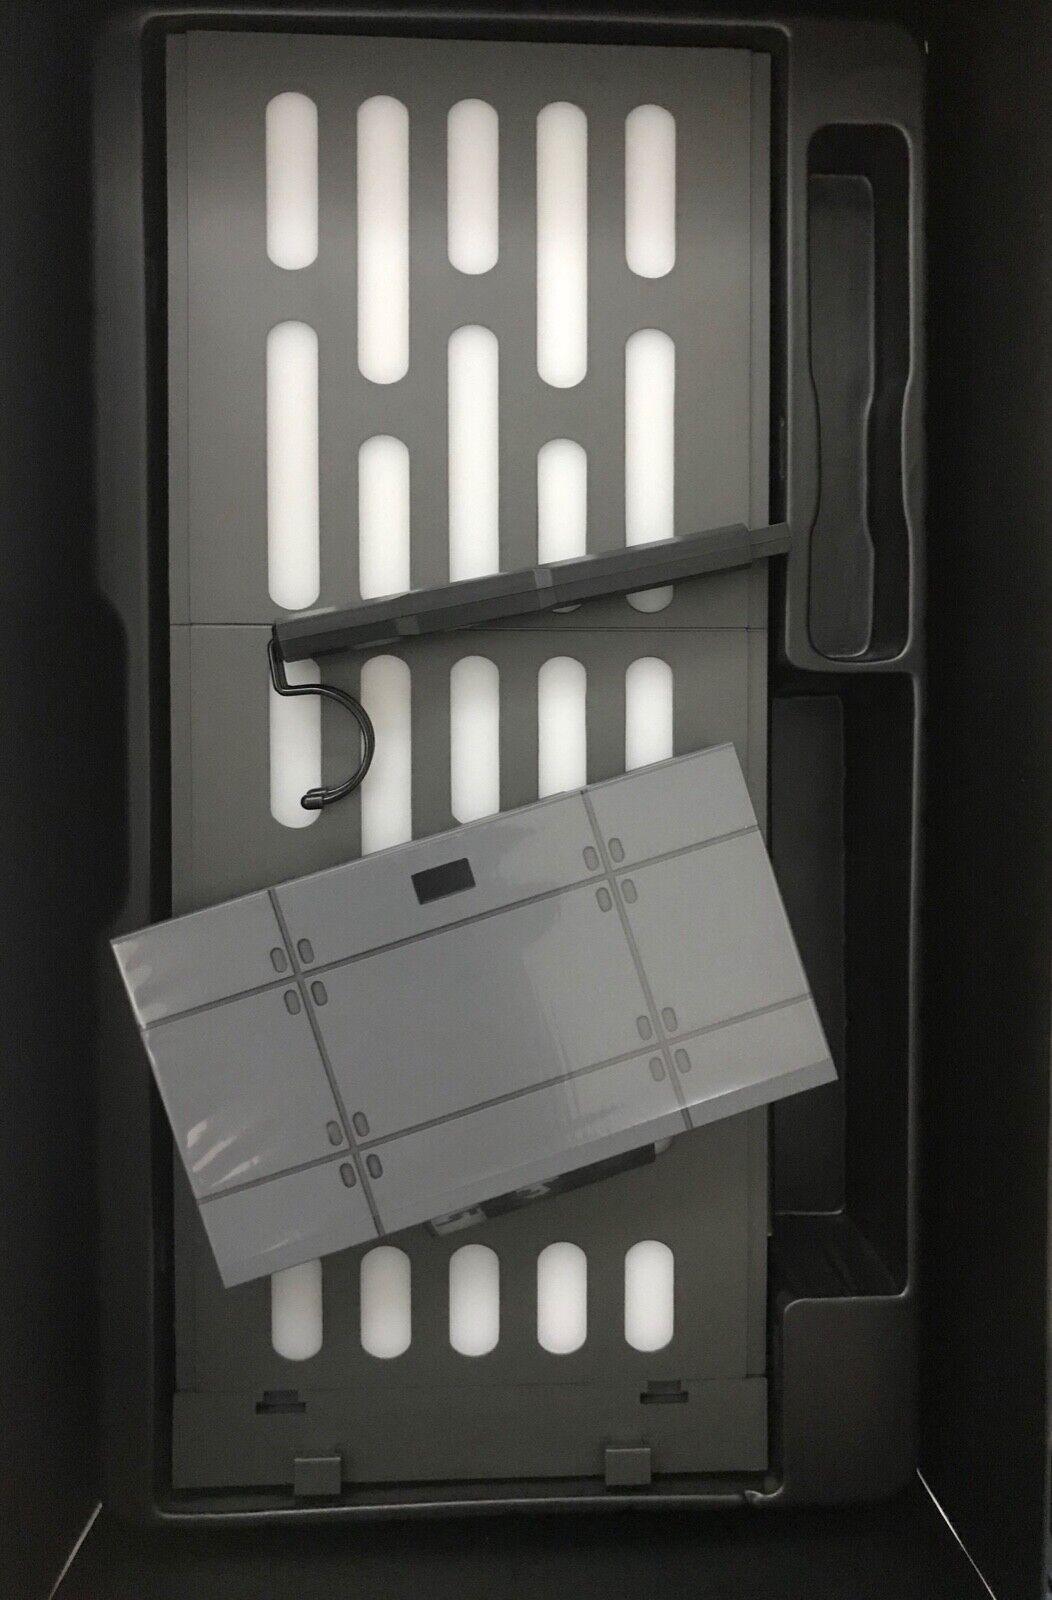 Calientegiocattoli estrella guerras STORM  TROOPER MMS515  - 1 6th scale LED Light-up platform  garanzia di credito